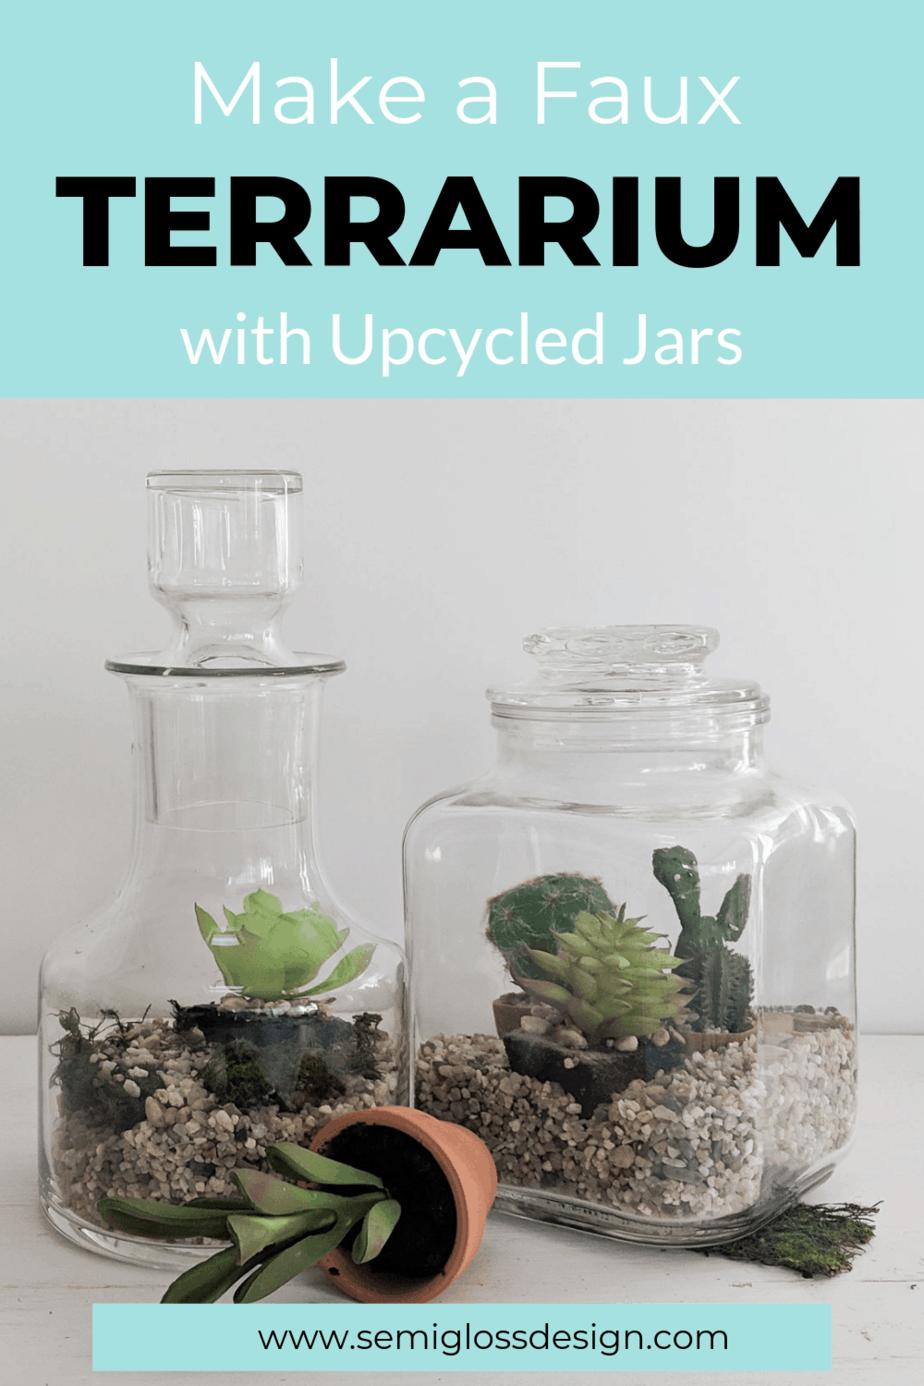 faux terrarium